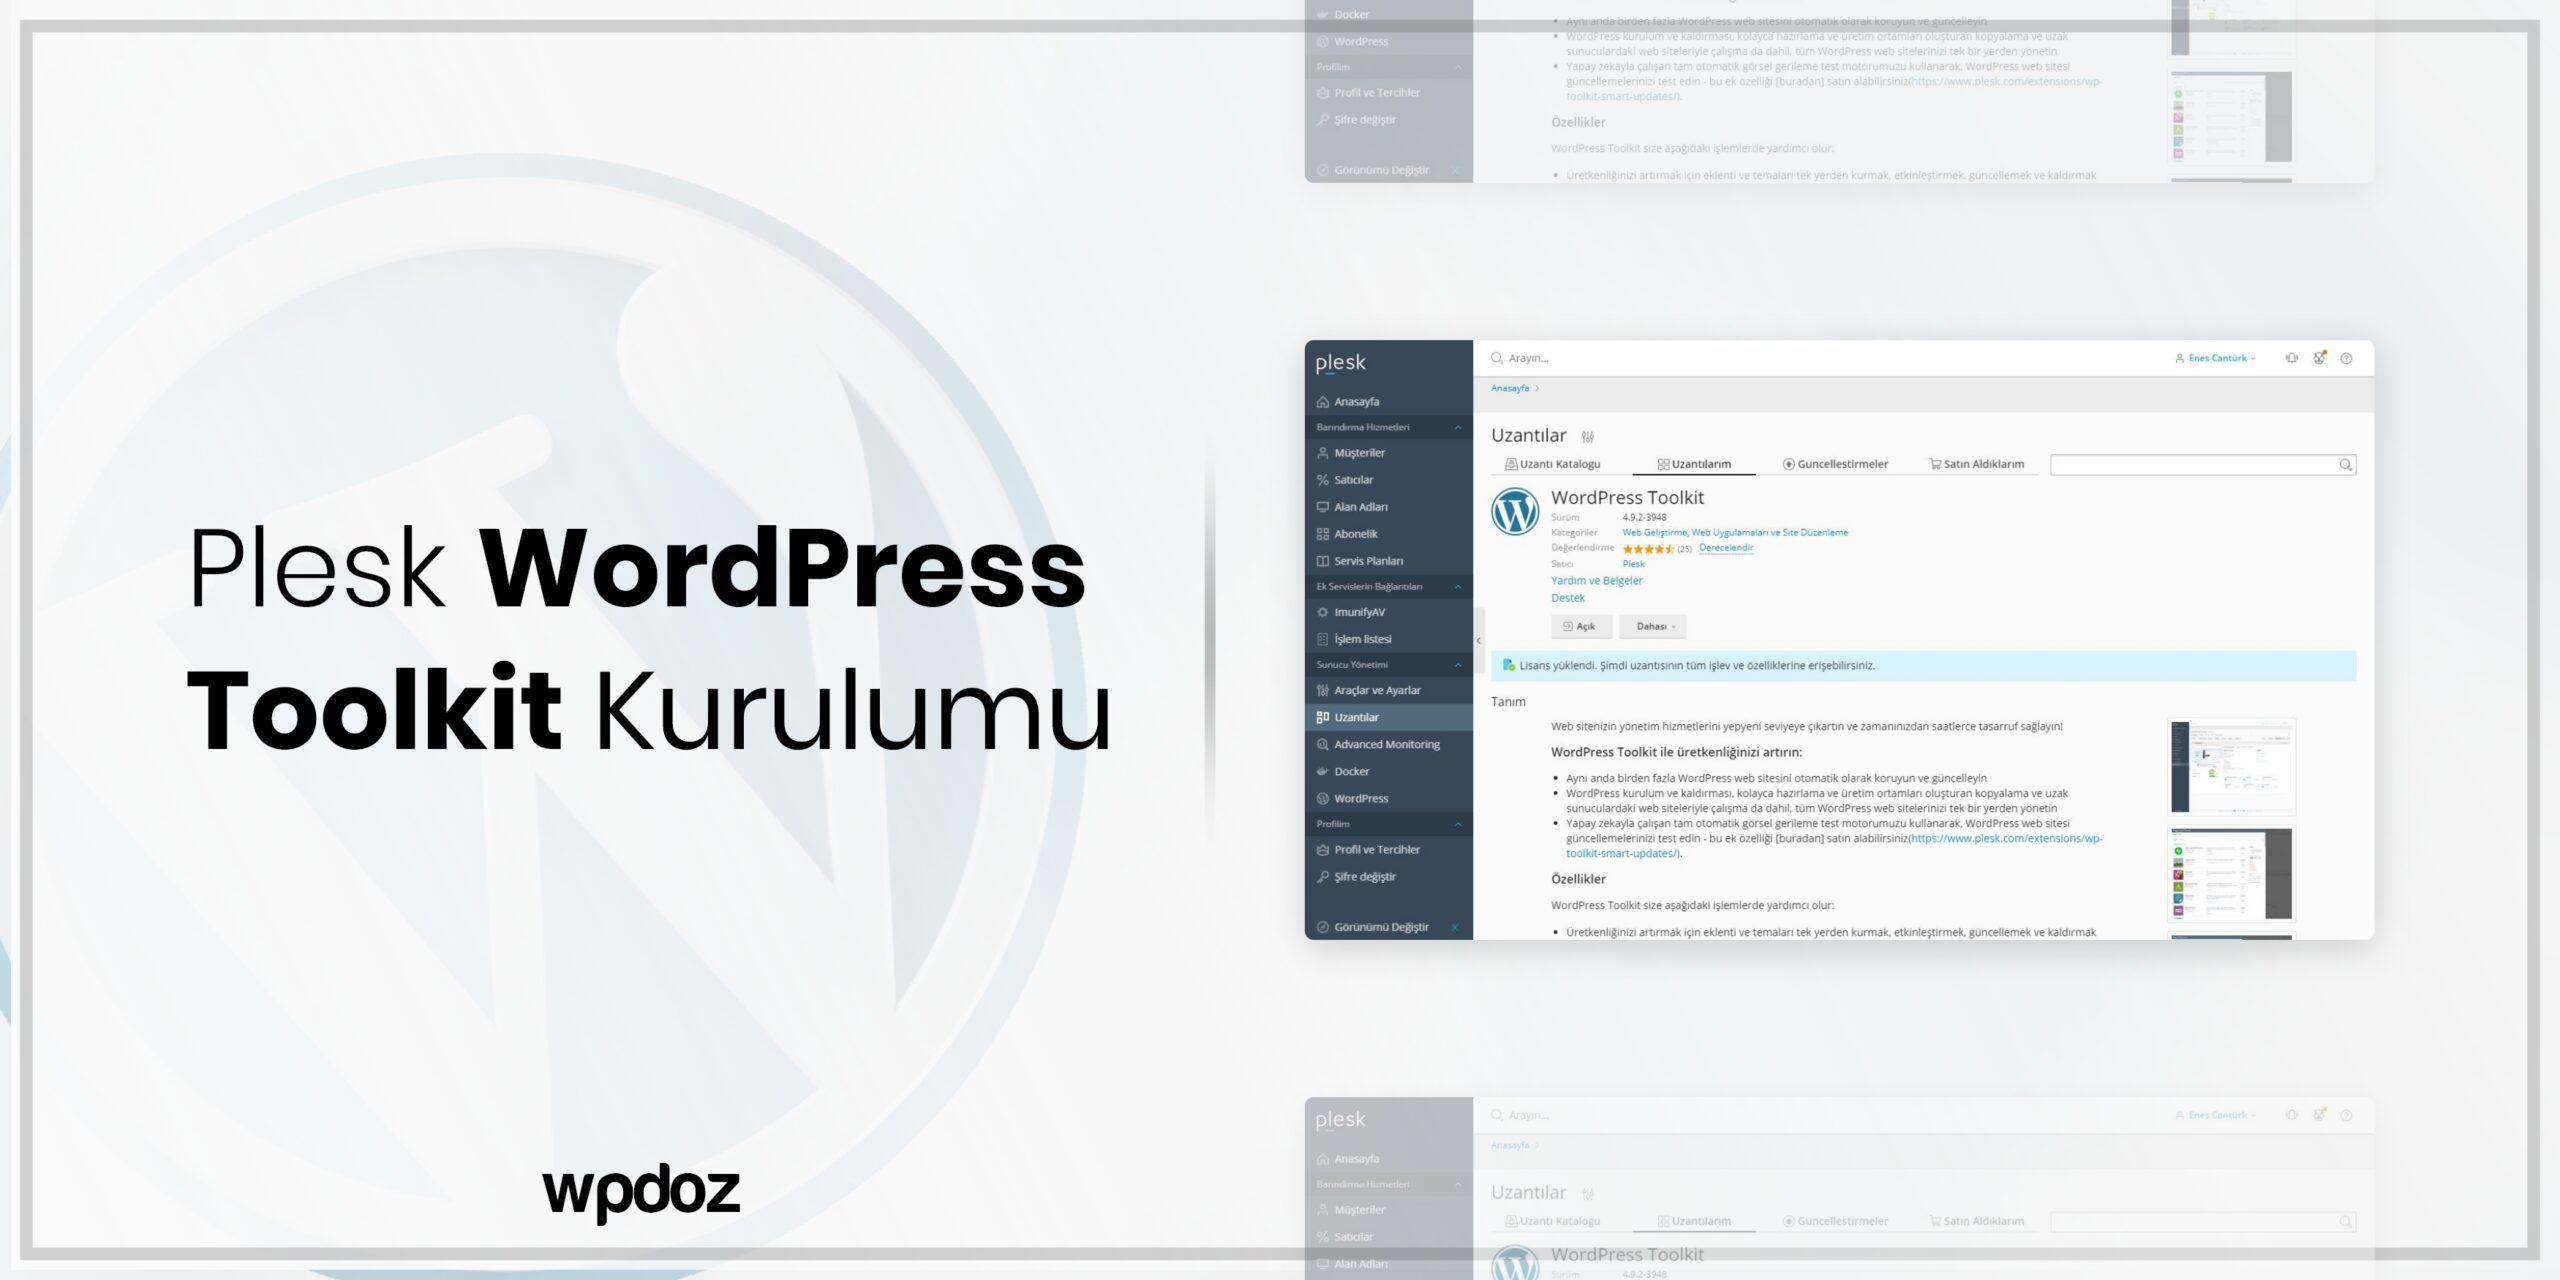 Plesk WordPress Toolkit Kurulumu